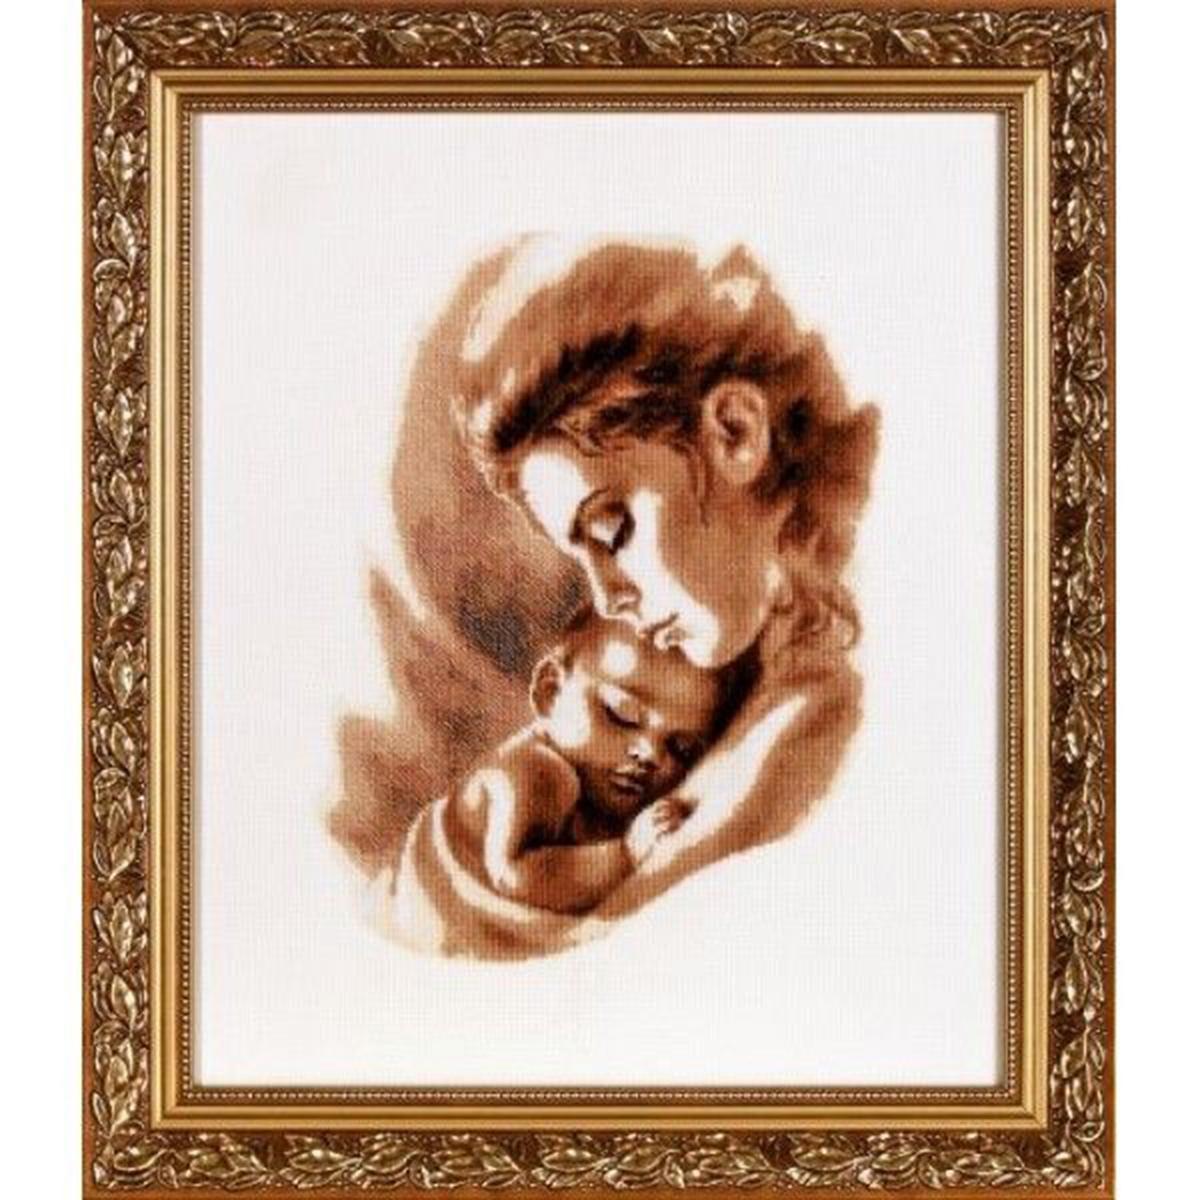 Набор для вышивания Alisena Мадонна с младенцем 2, 23 x 30 см688804